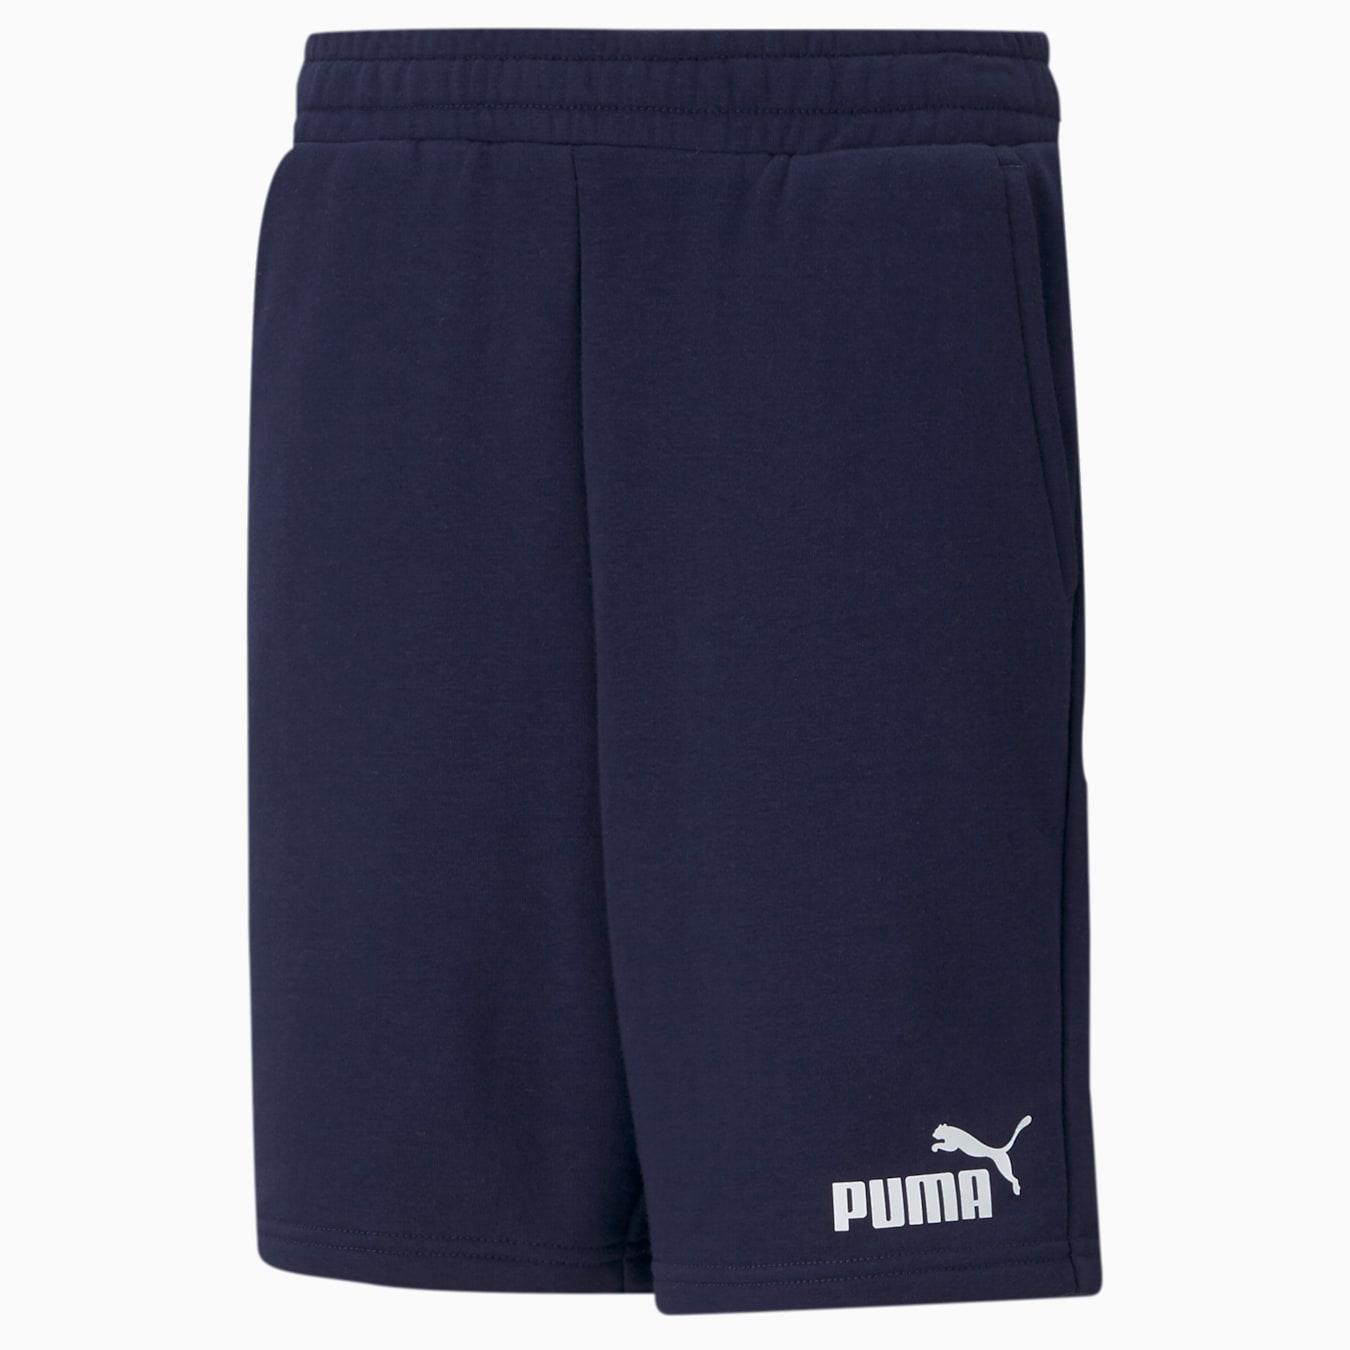 Pantaloncino da Bambino/Ragazzo Puma Essentials PUMA | 2132079765 | 586972006